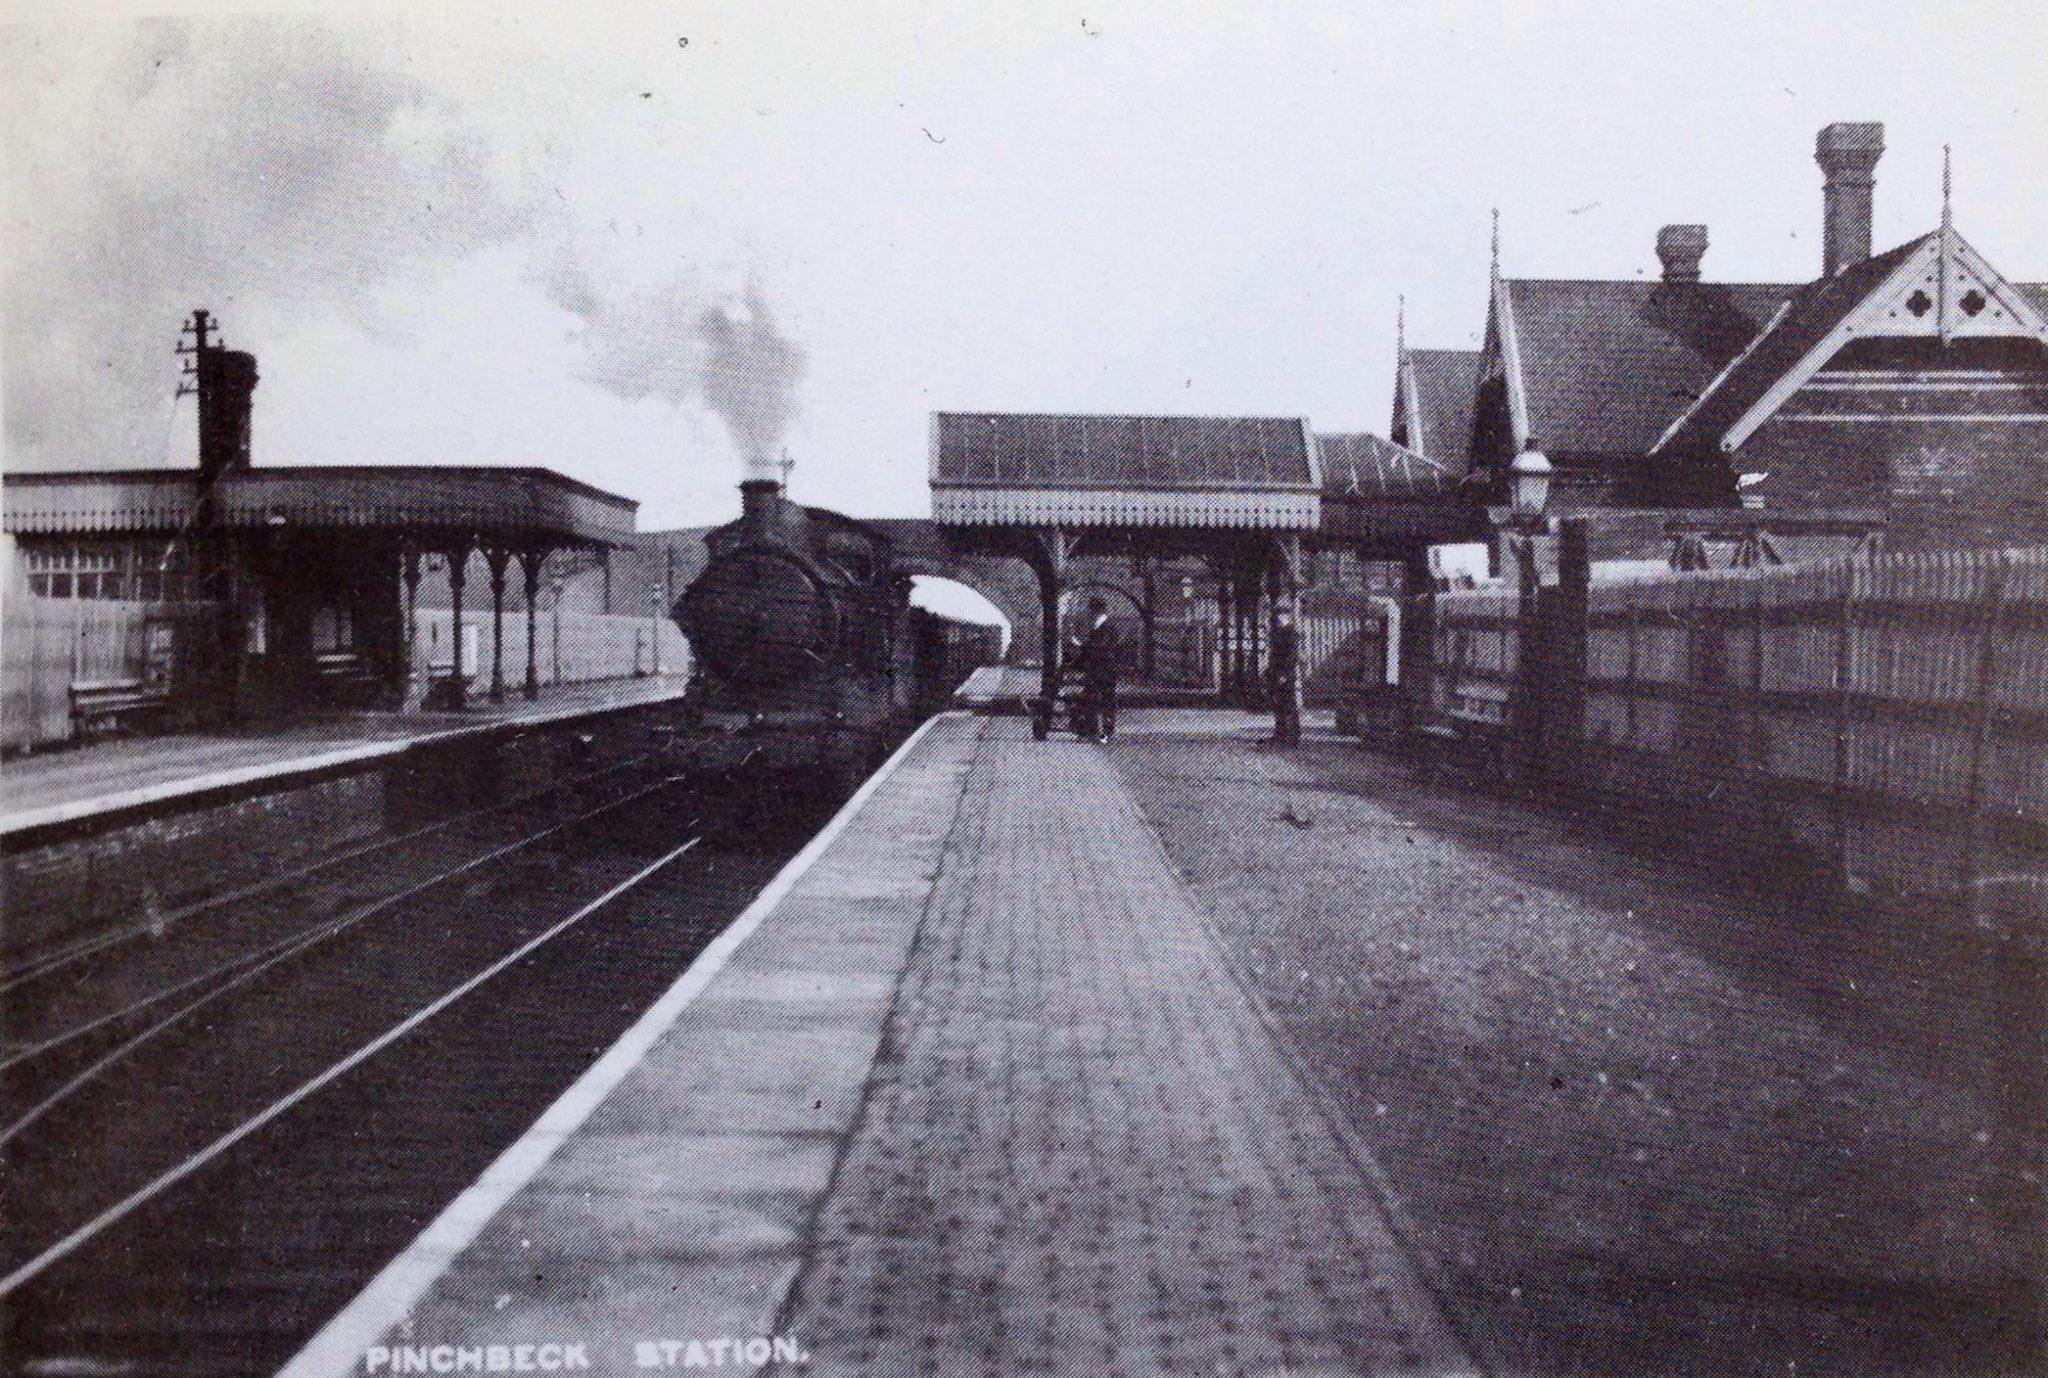 Pinchbeck Station